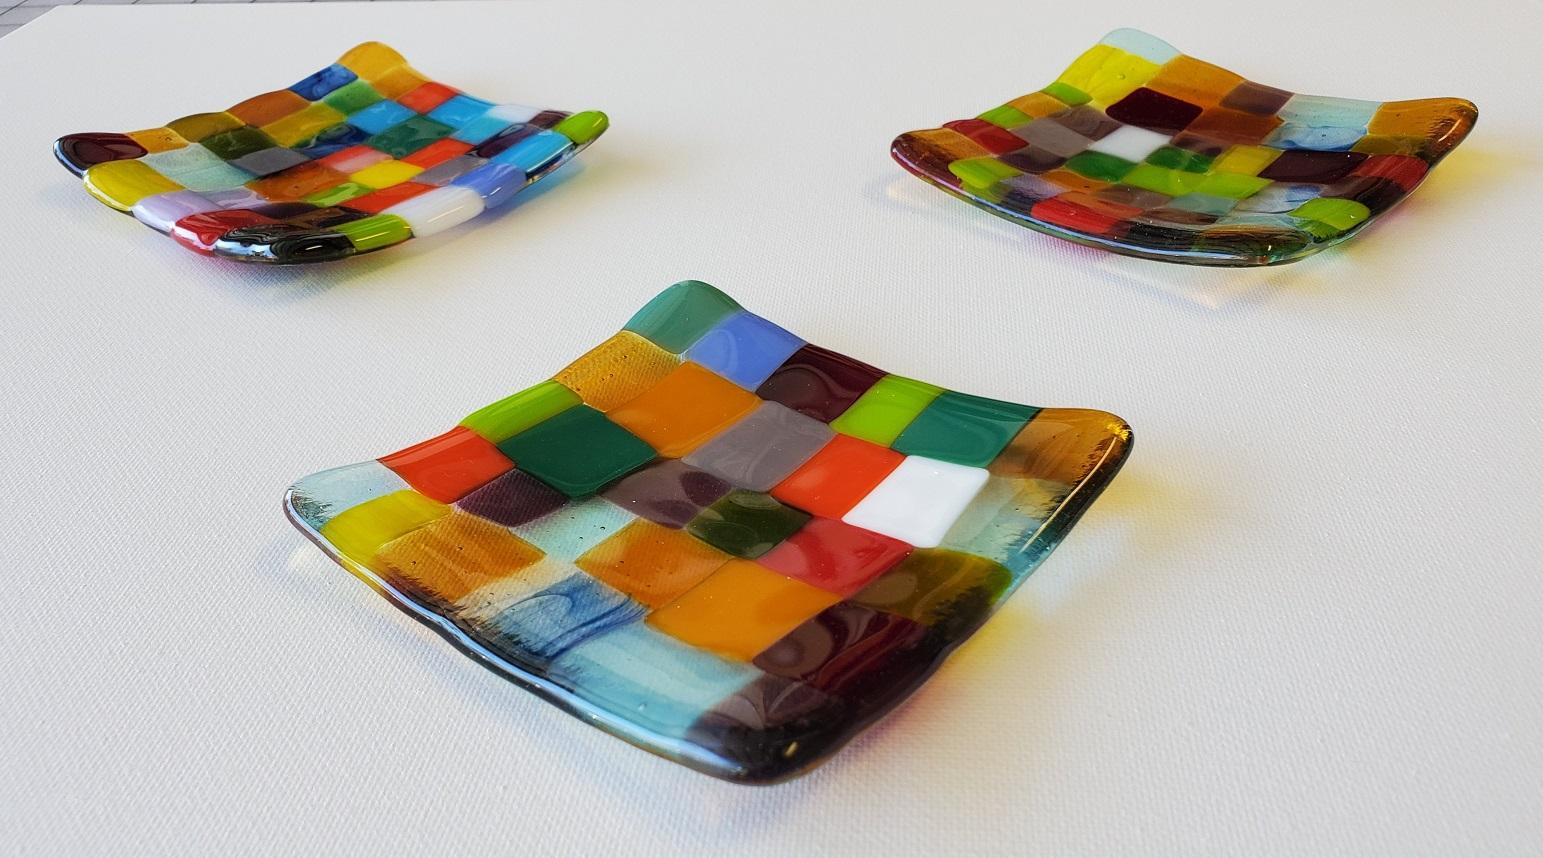 Glasskit - Creative Glass Art Kits for Kids Online at Ilanit Shalev